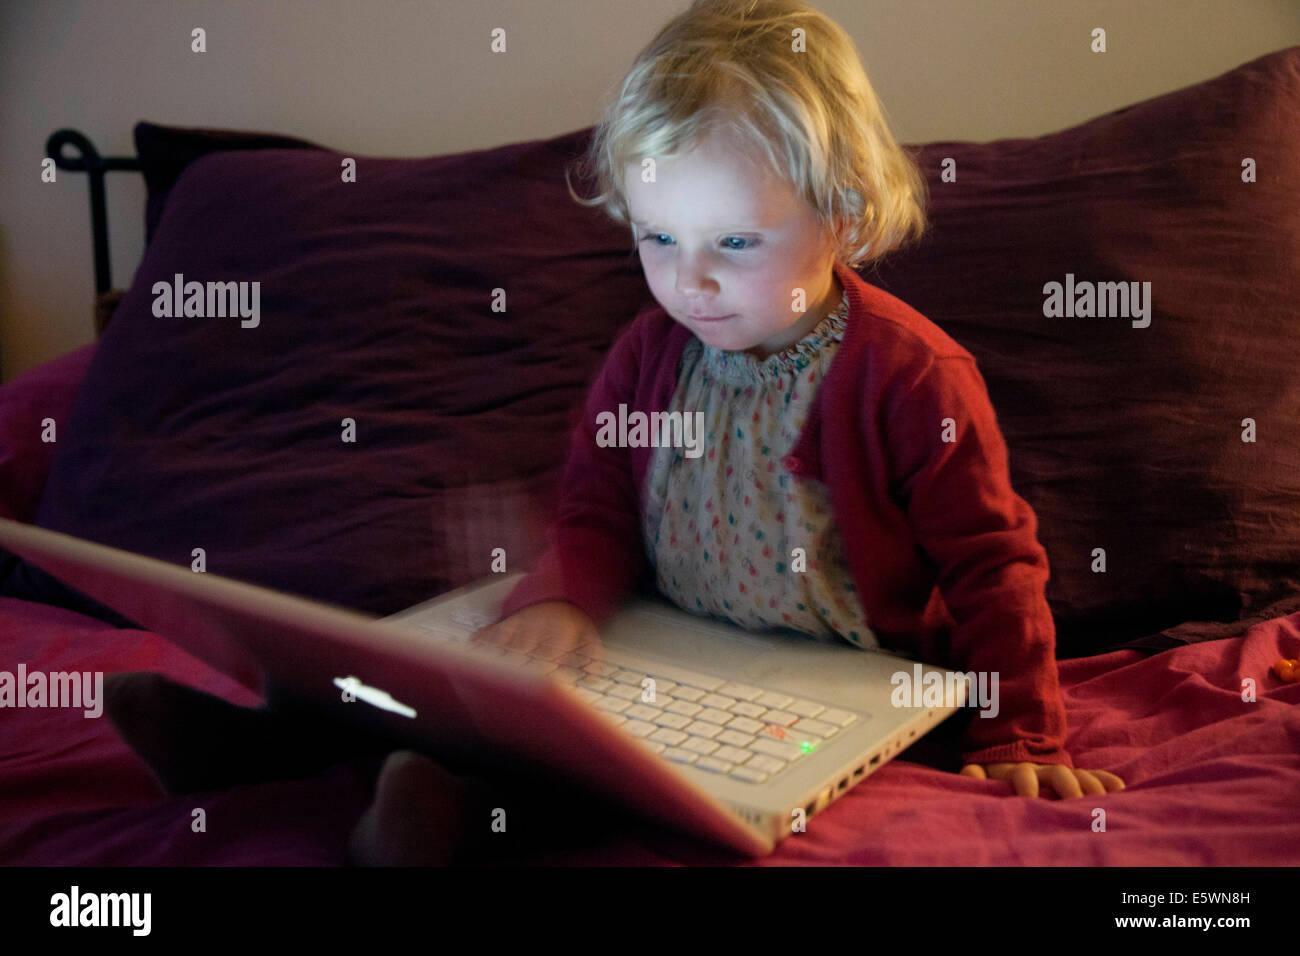 Child, computer - Stock Image